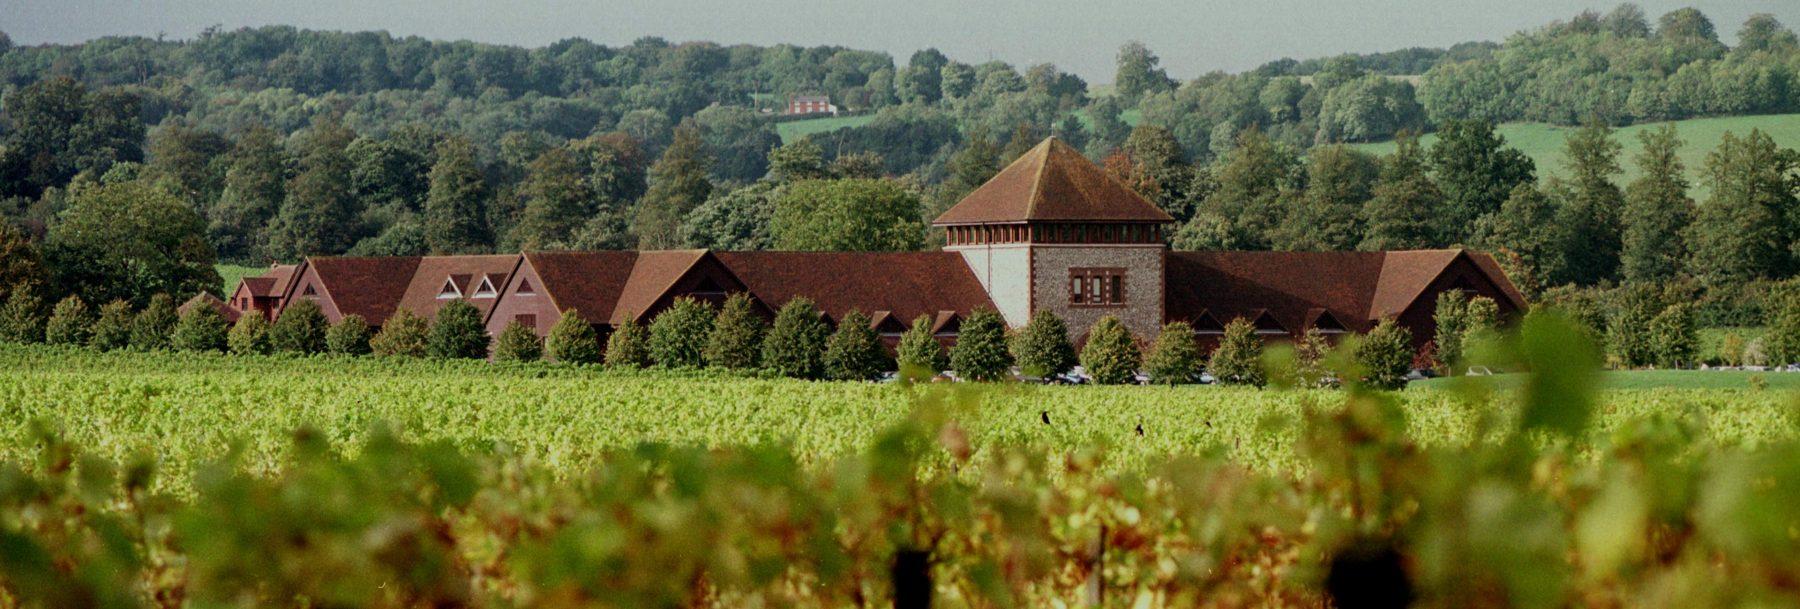 Denbies Wine Estate and vineyards